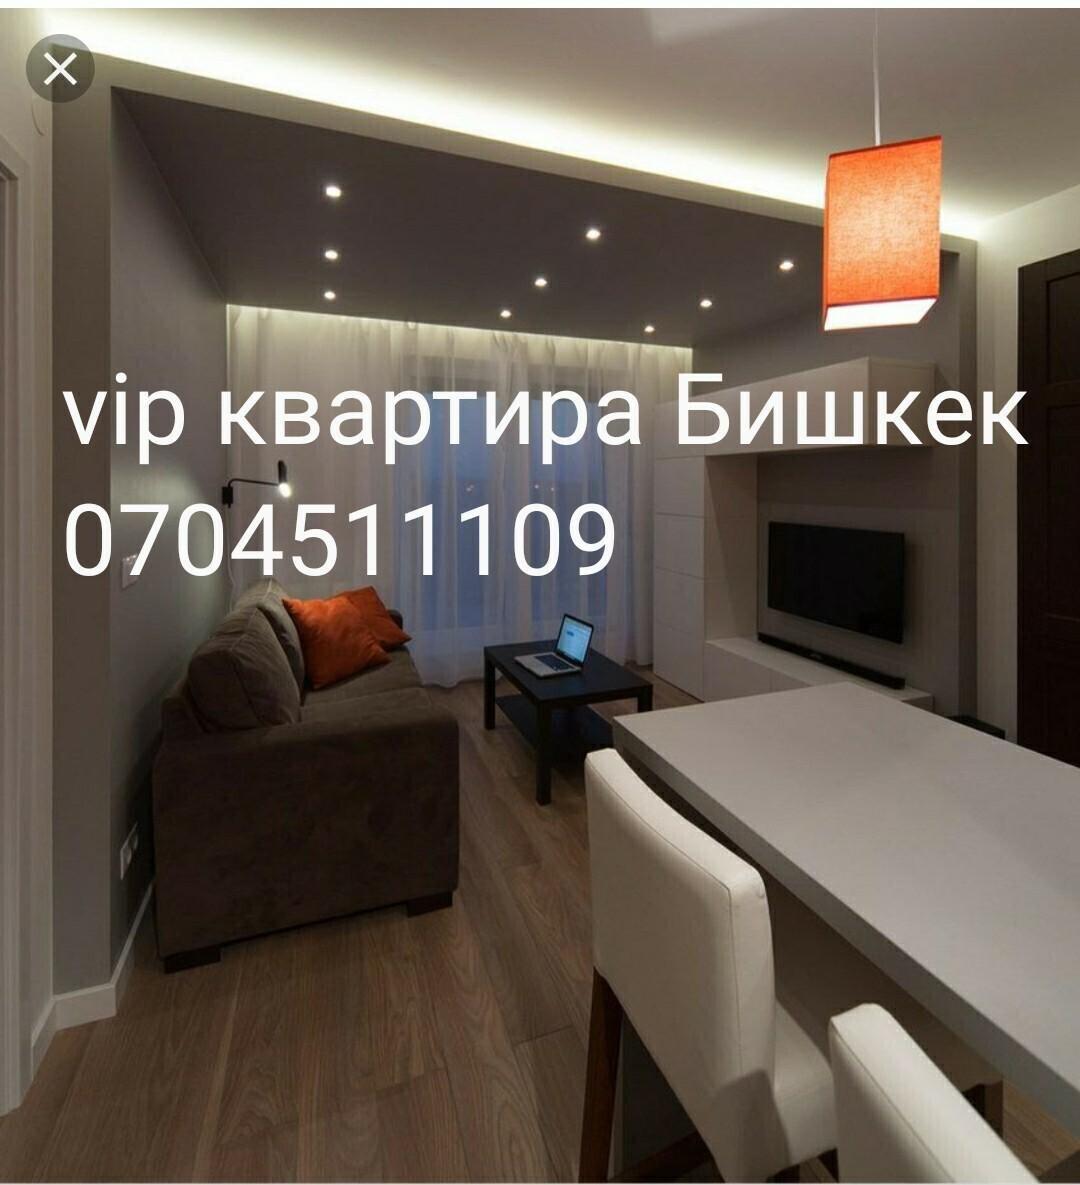 vip гостиница - Бизнес-профиль компании на lalafo.kg | Кыргызстан